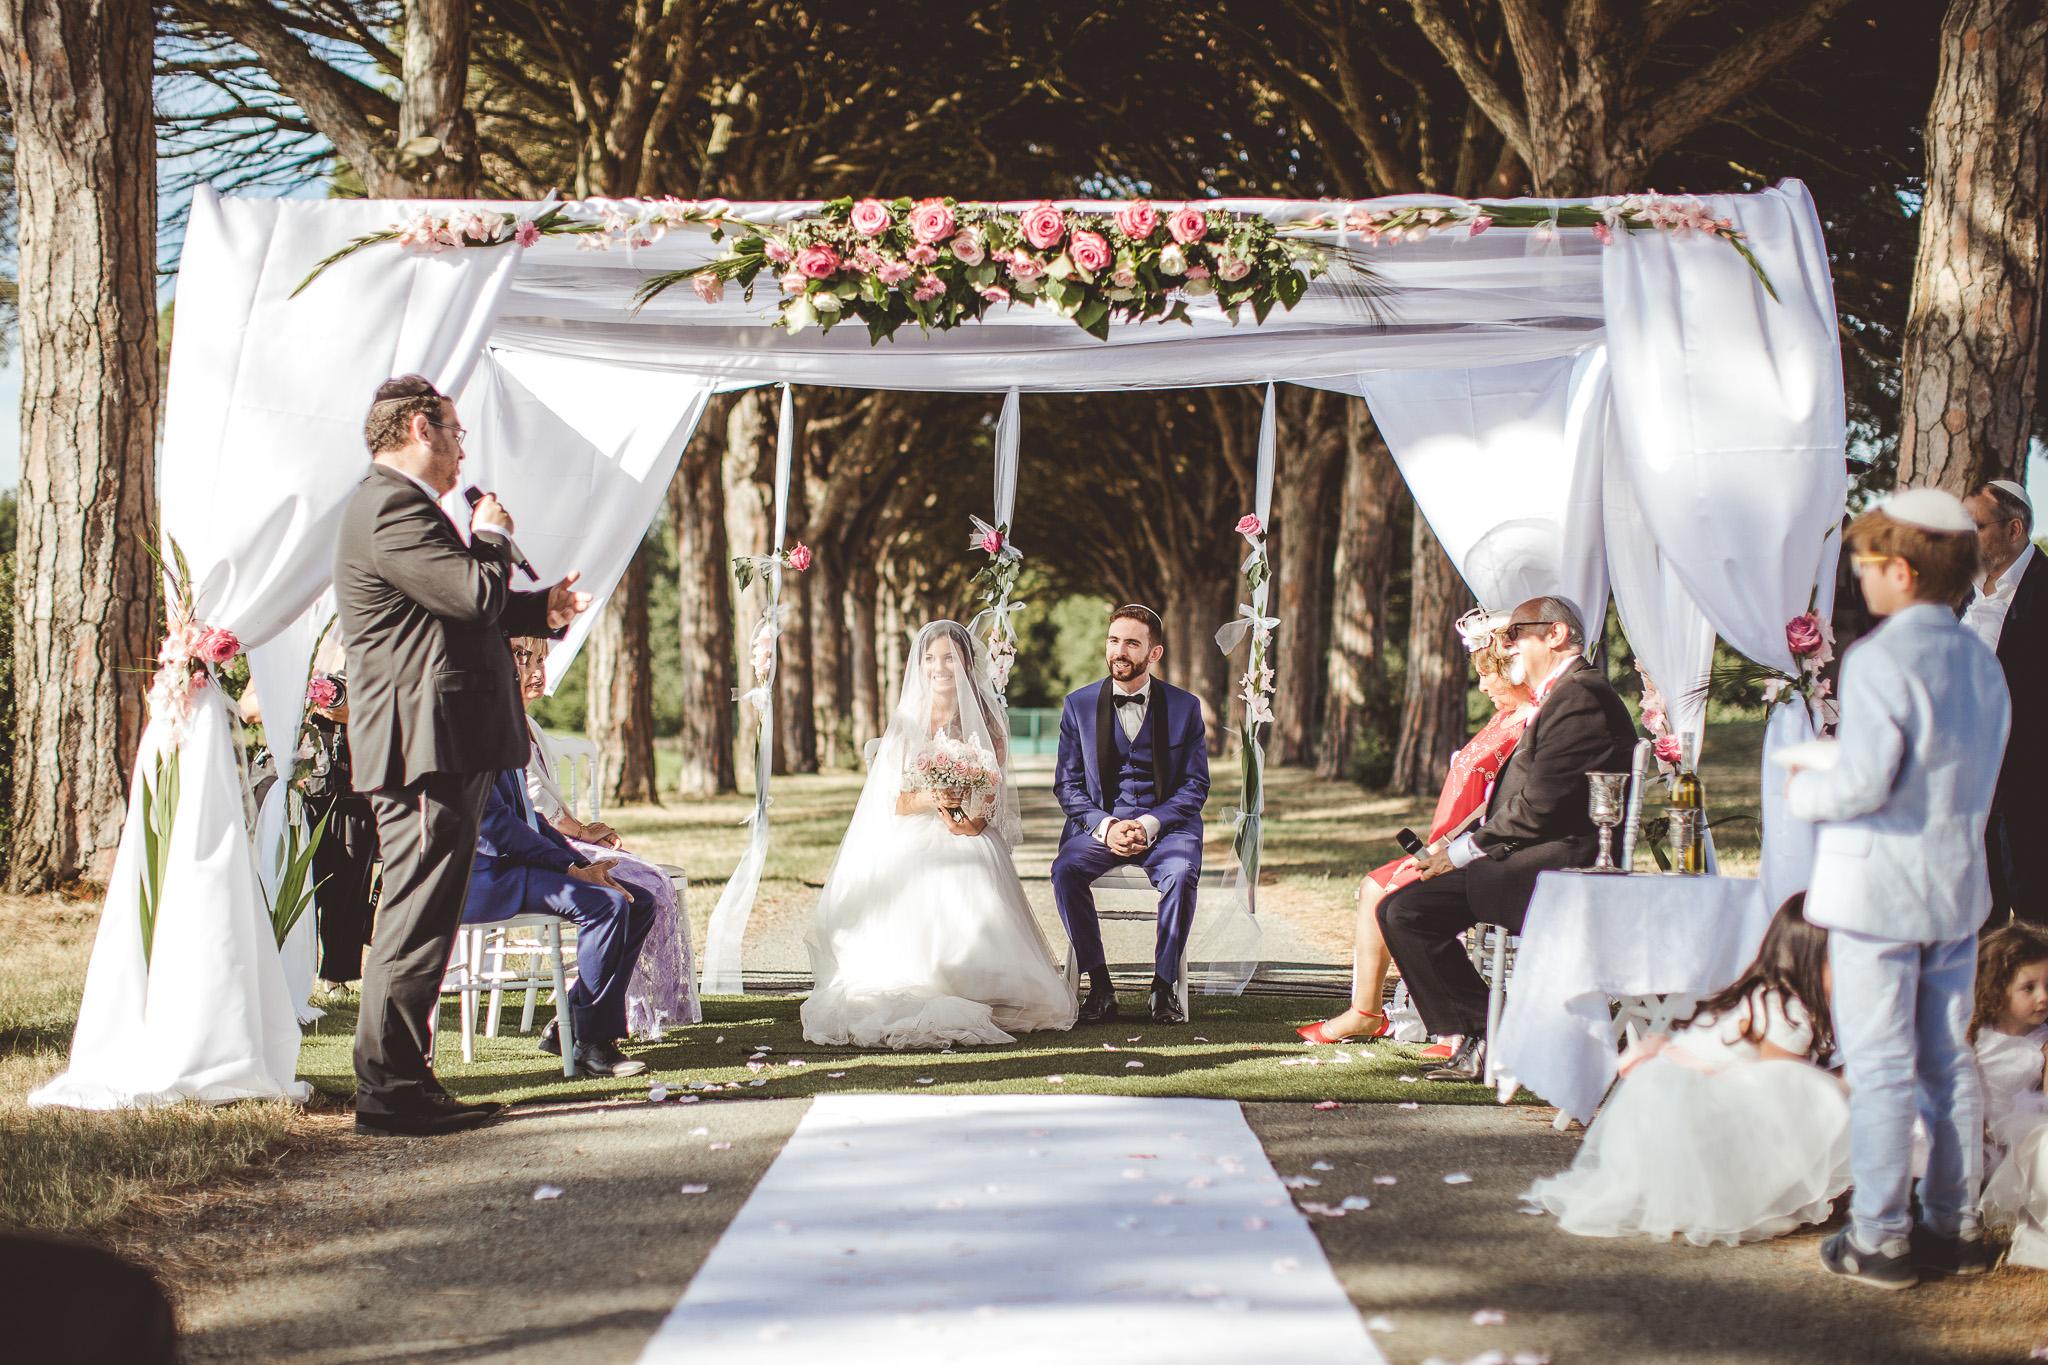 reportage mariage photo ceremonie religieuse juive exterieur domaine preissac toulouse mazeltov